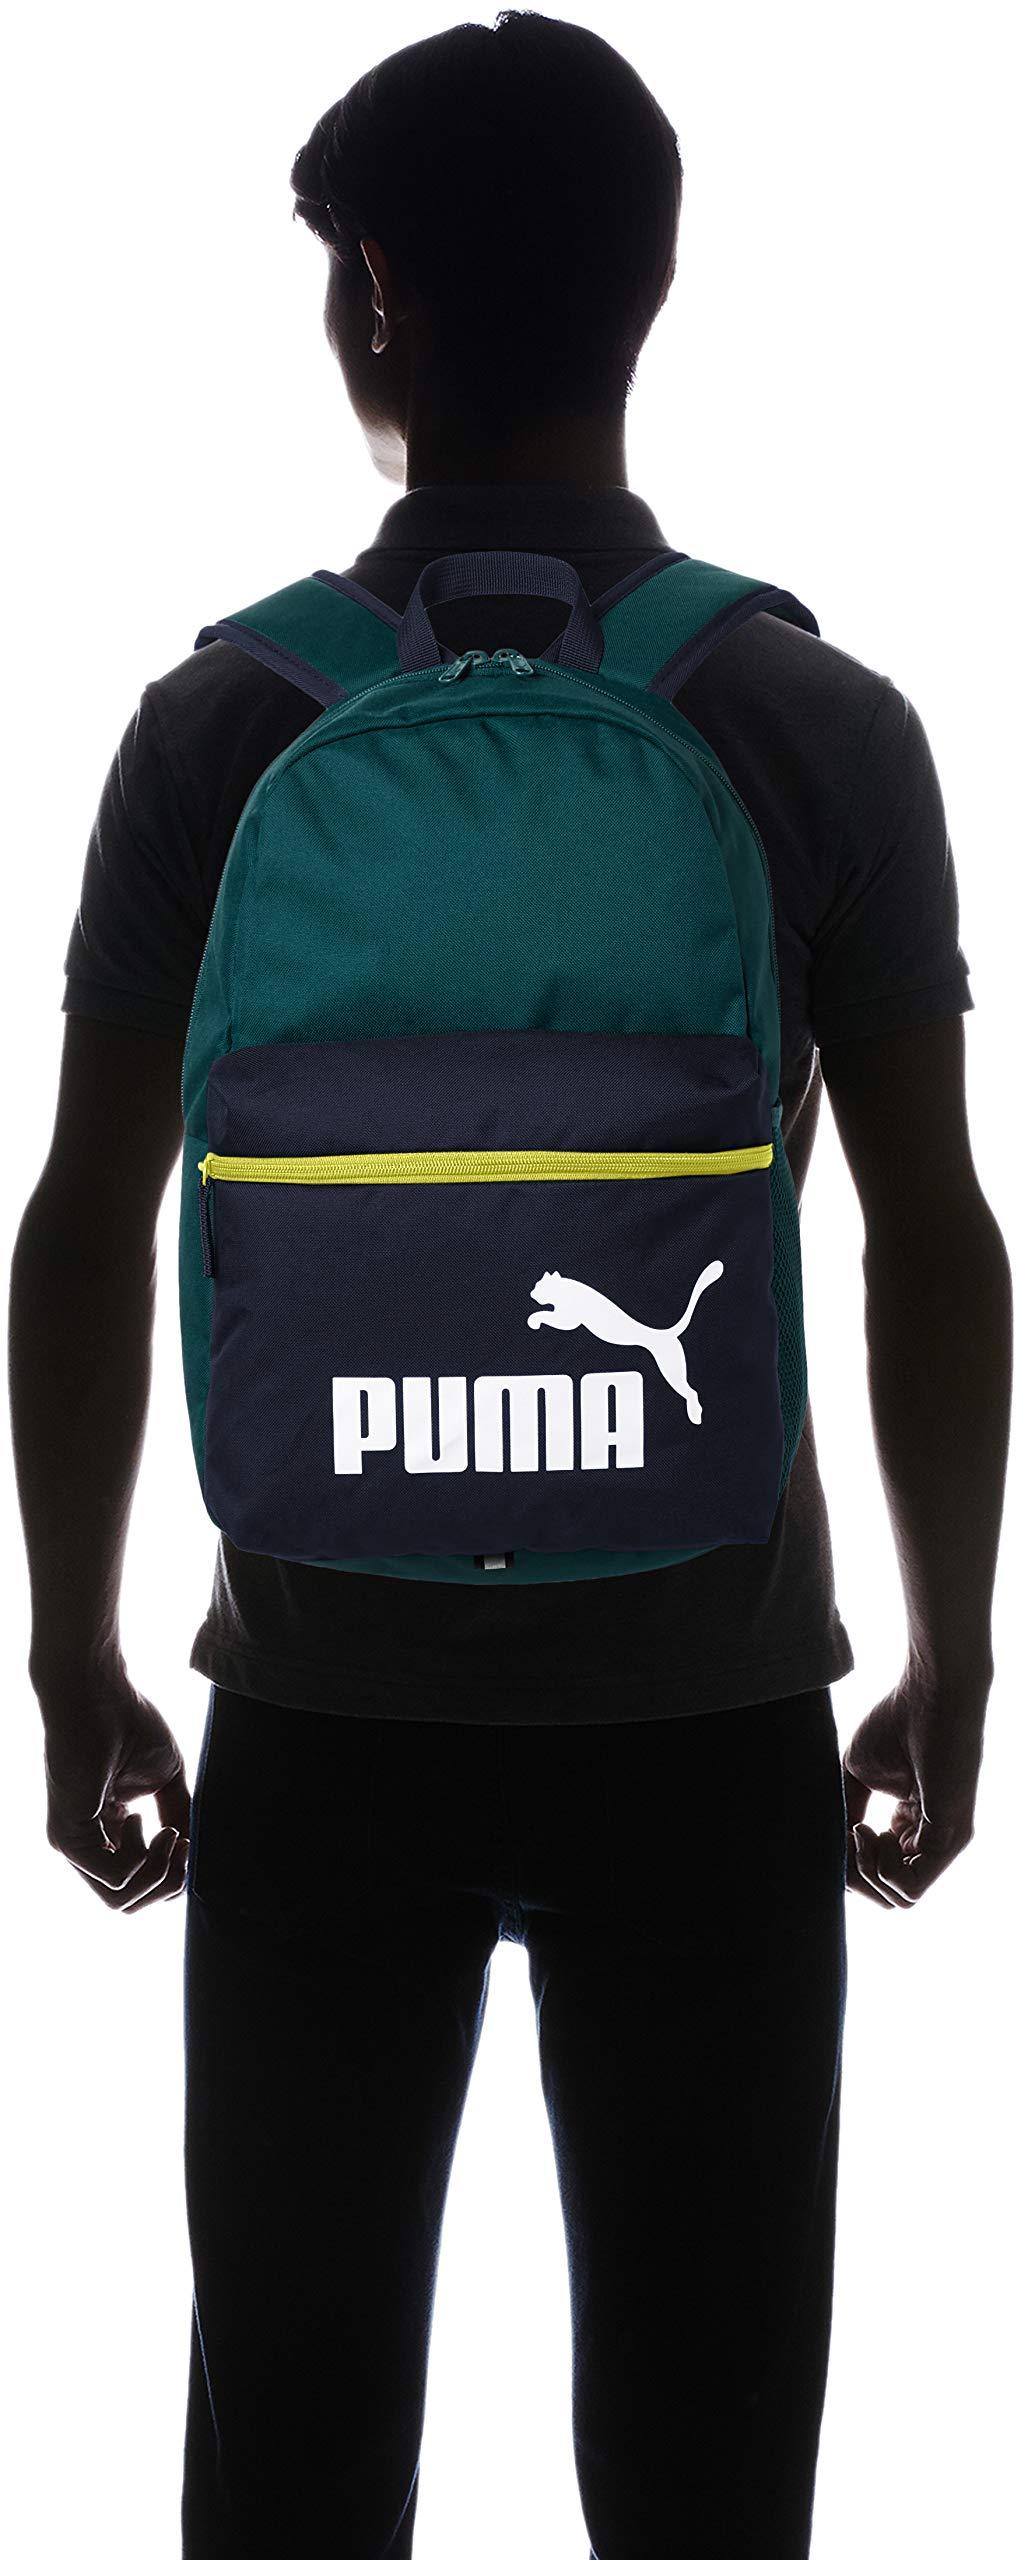 71qPUbRN3pL - Puma Phase - Mochila, Unisex Adulto